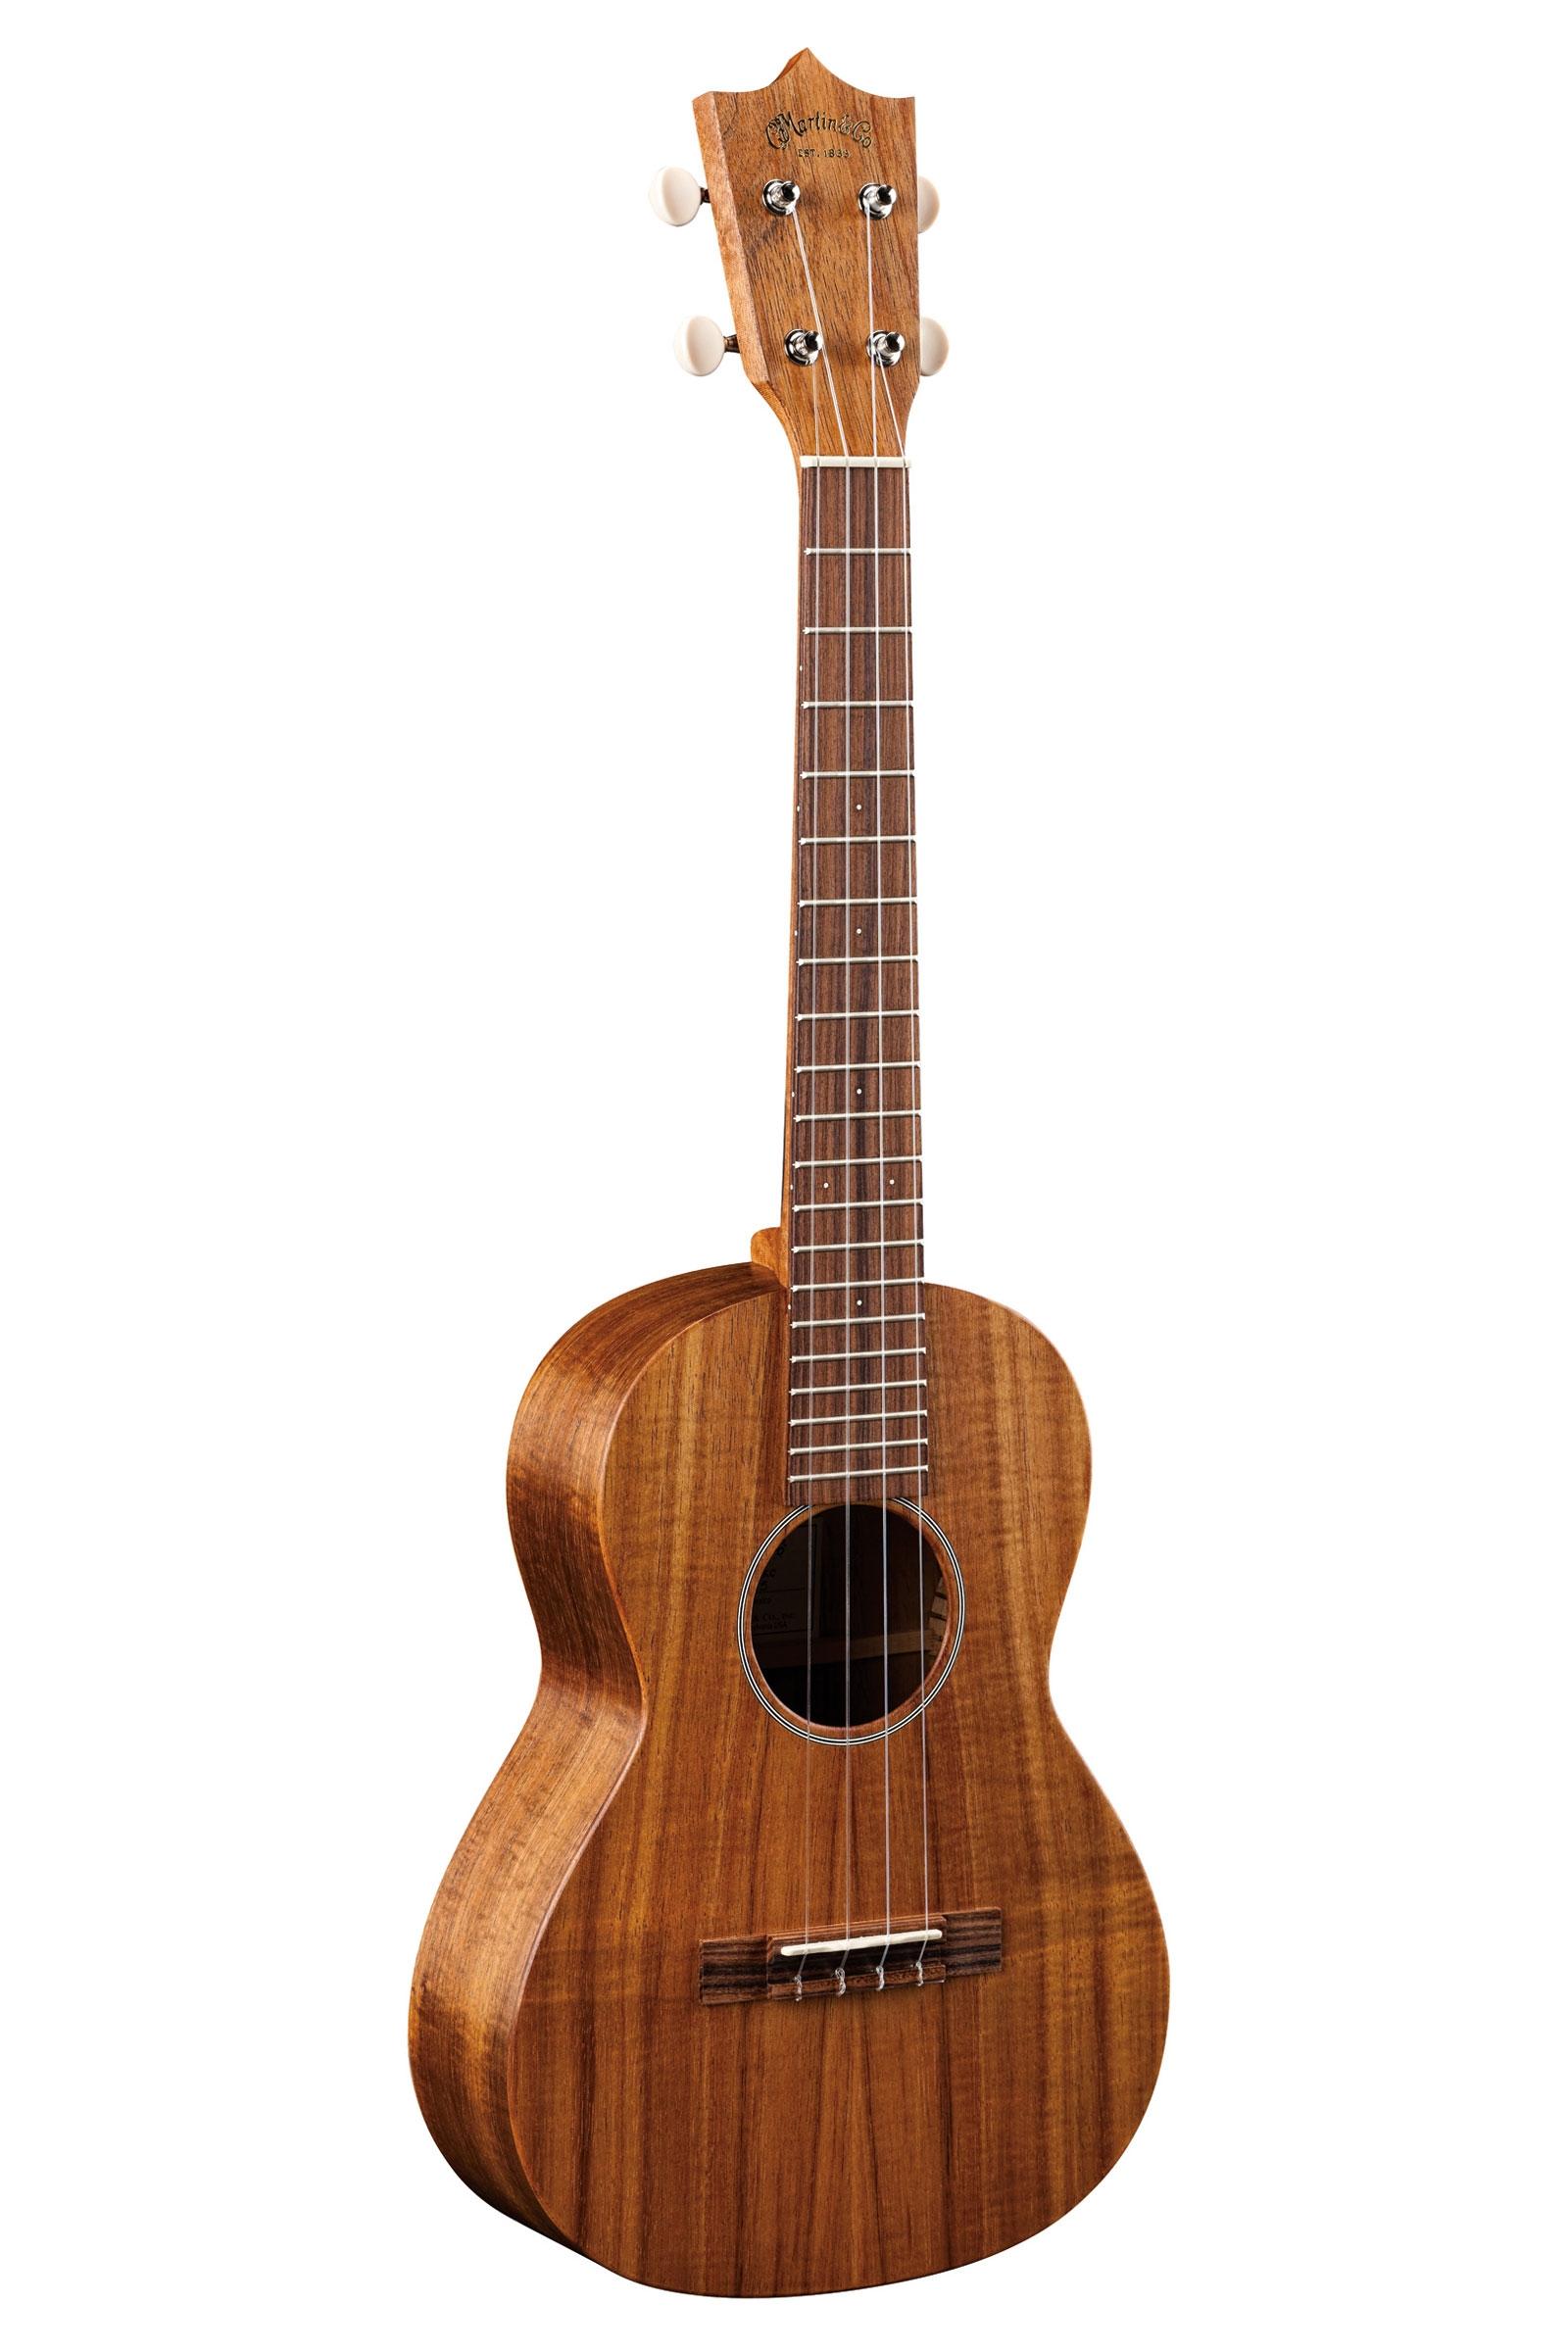 martin t1k tenor ukulele koa natural w gigbag ebay. Black Bedroom Furniture Sets. Home Design Ideas